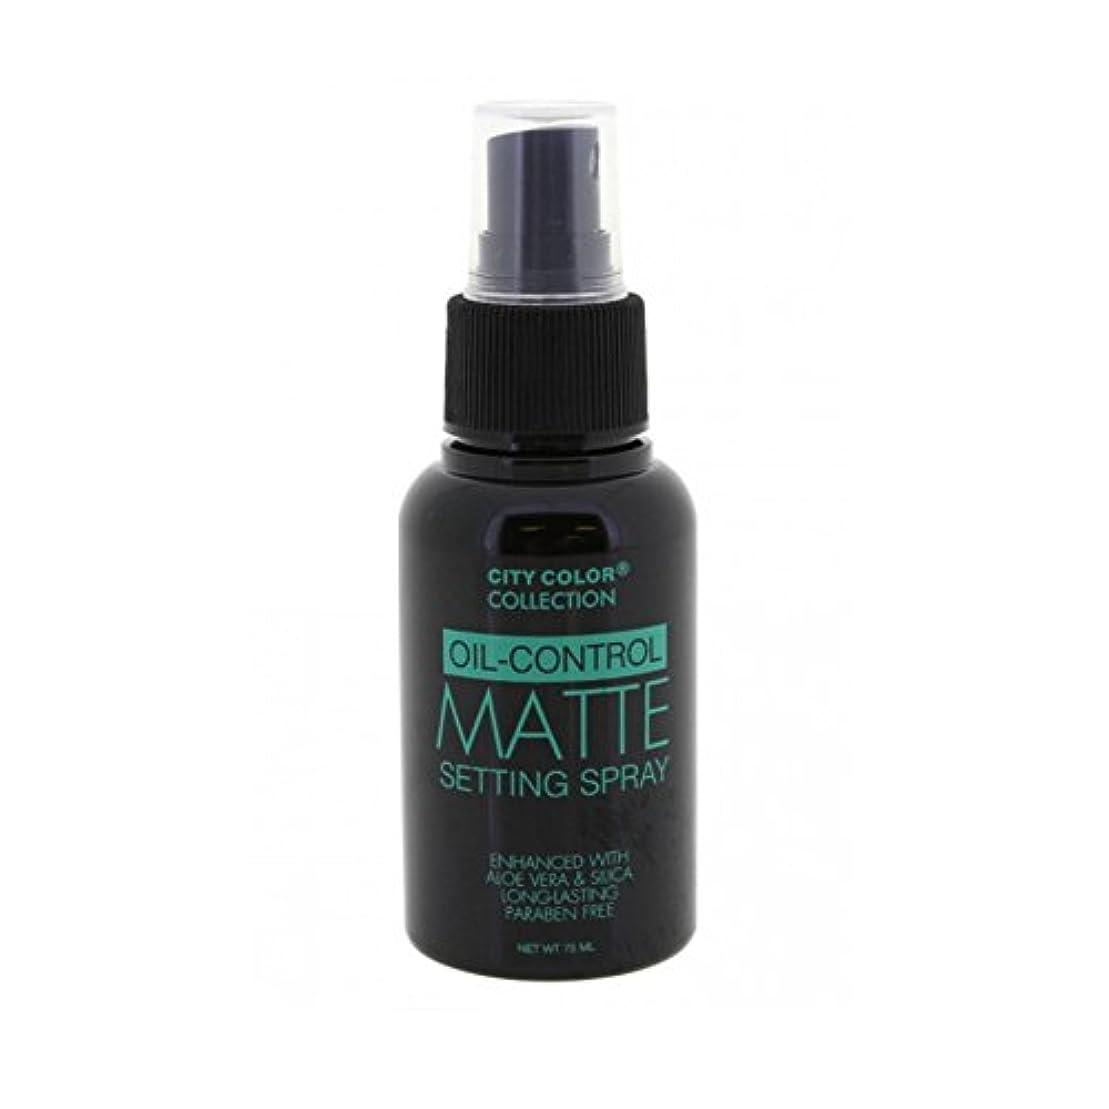 (3 Pack) CITY COLOR Oil-Control Matte Setting Spray (並行輸入品)